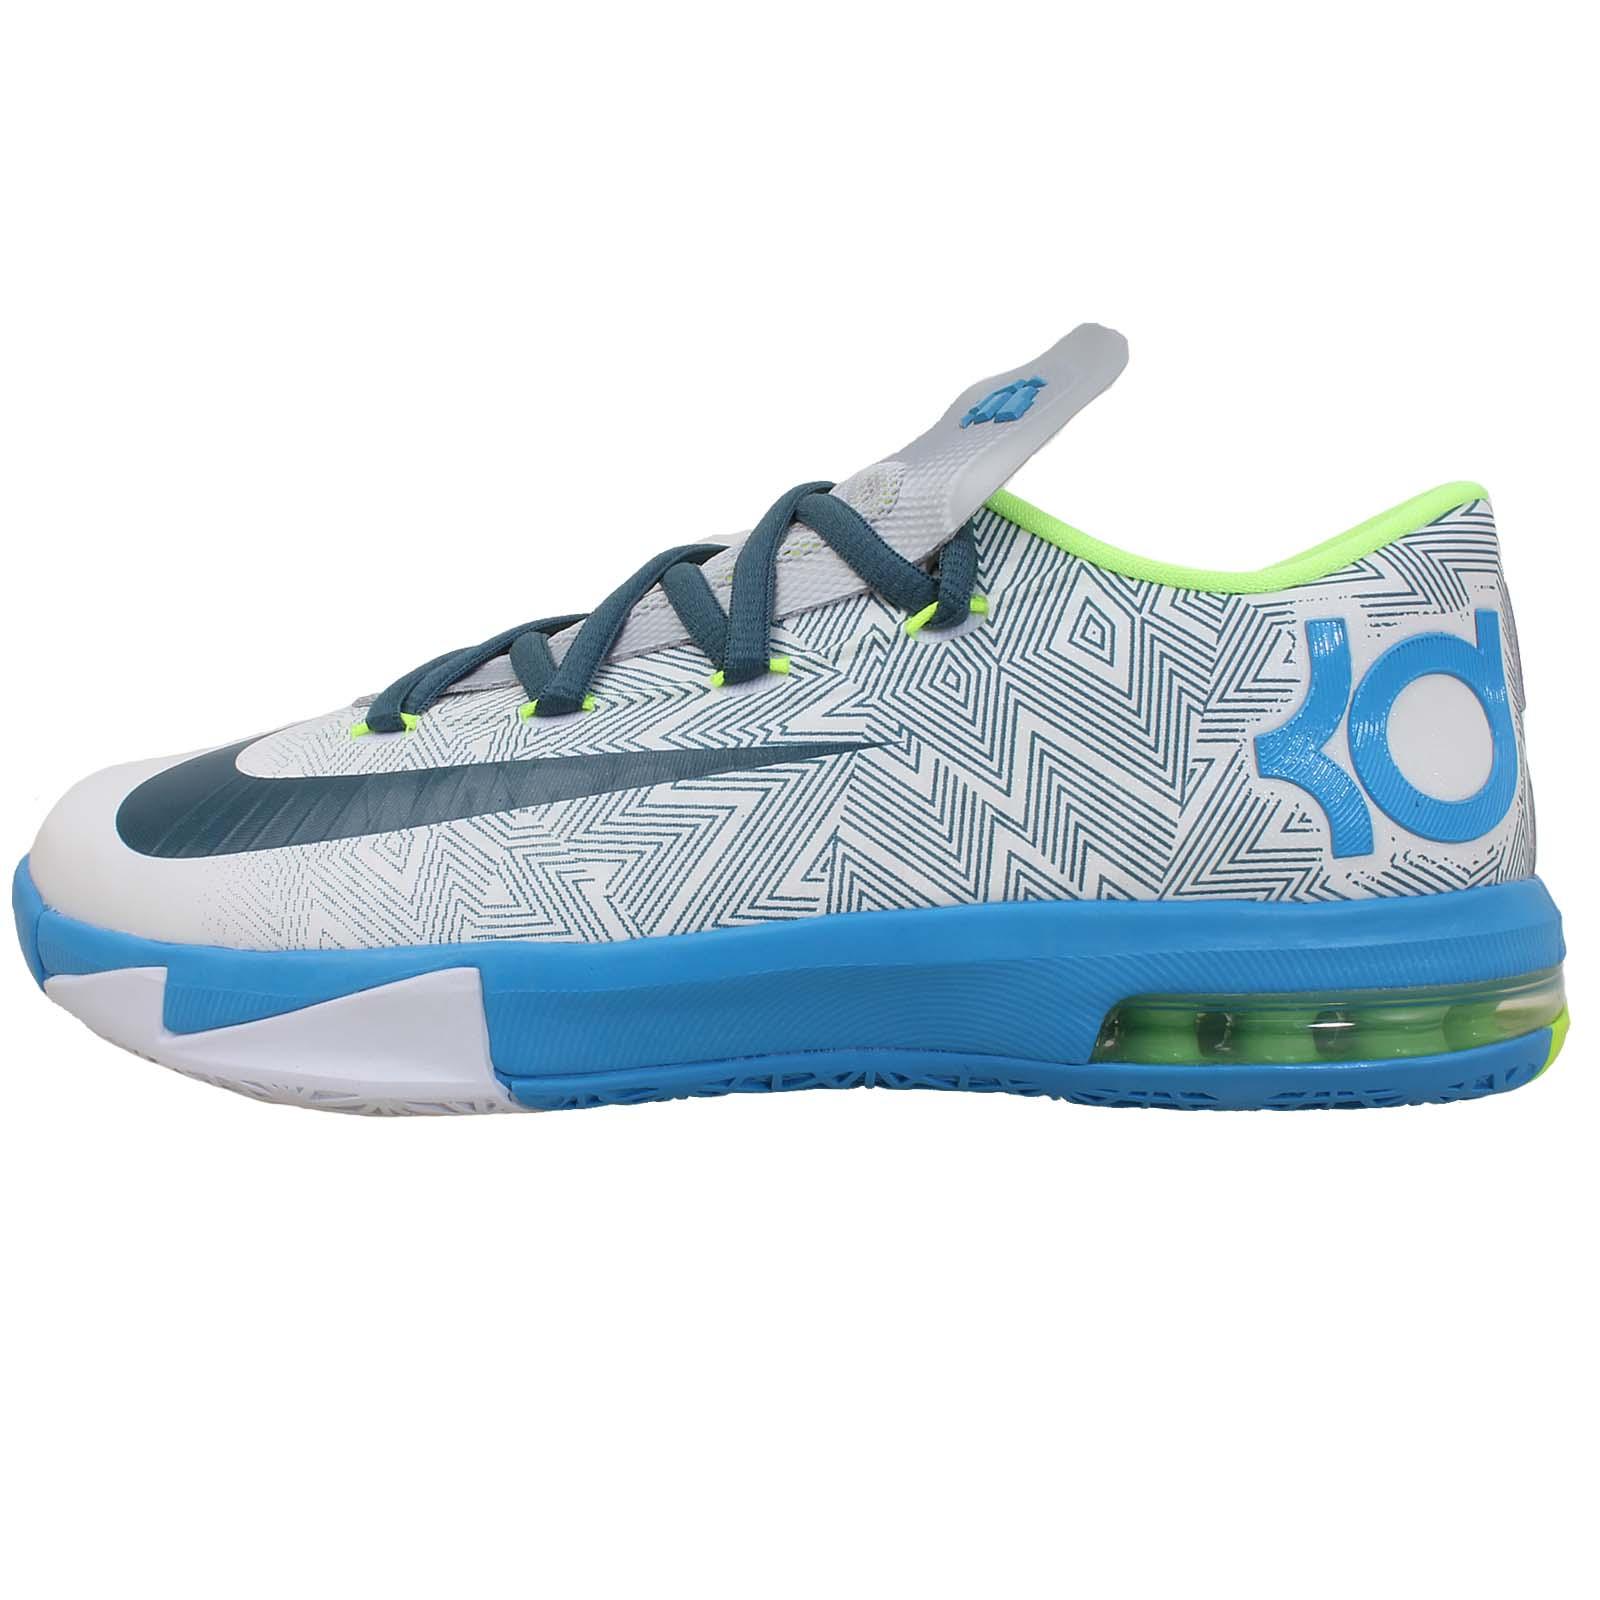 Nike KD VI 6 GS Air Max Kevin Durant Boys Kids Youth ...